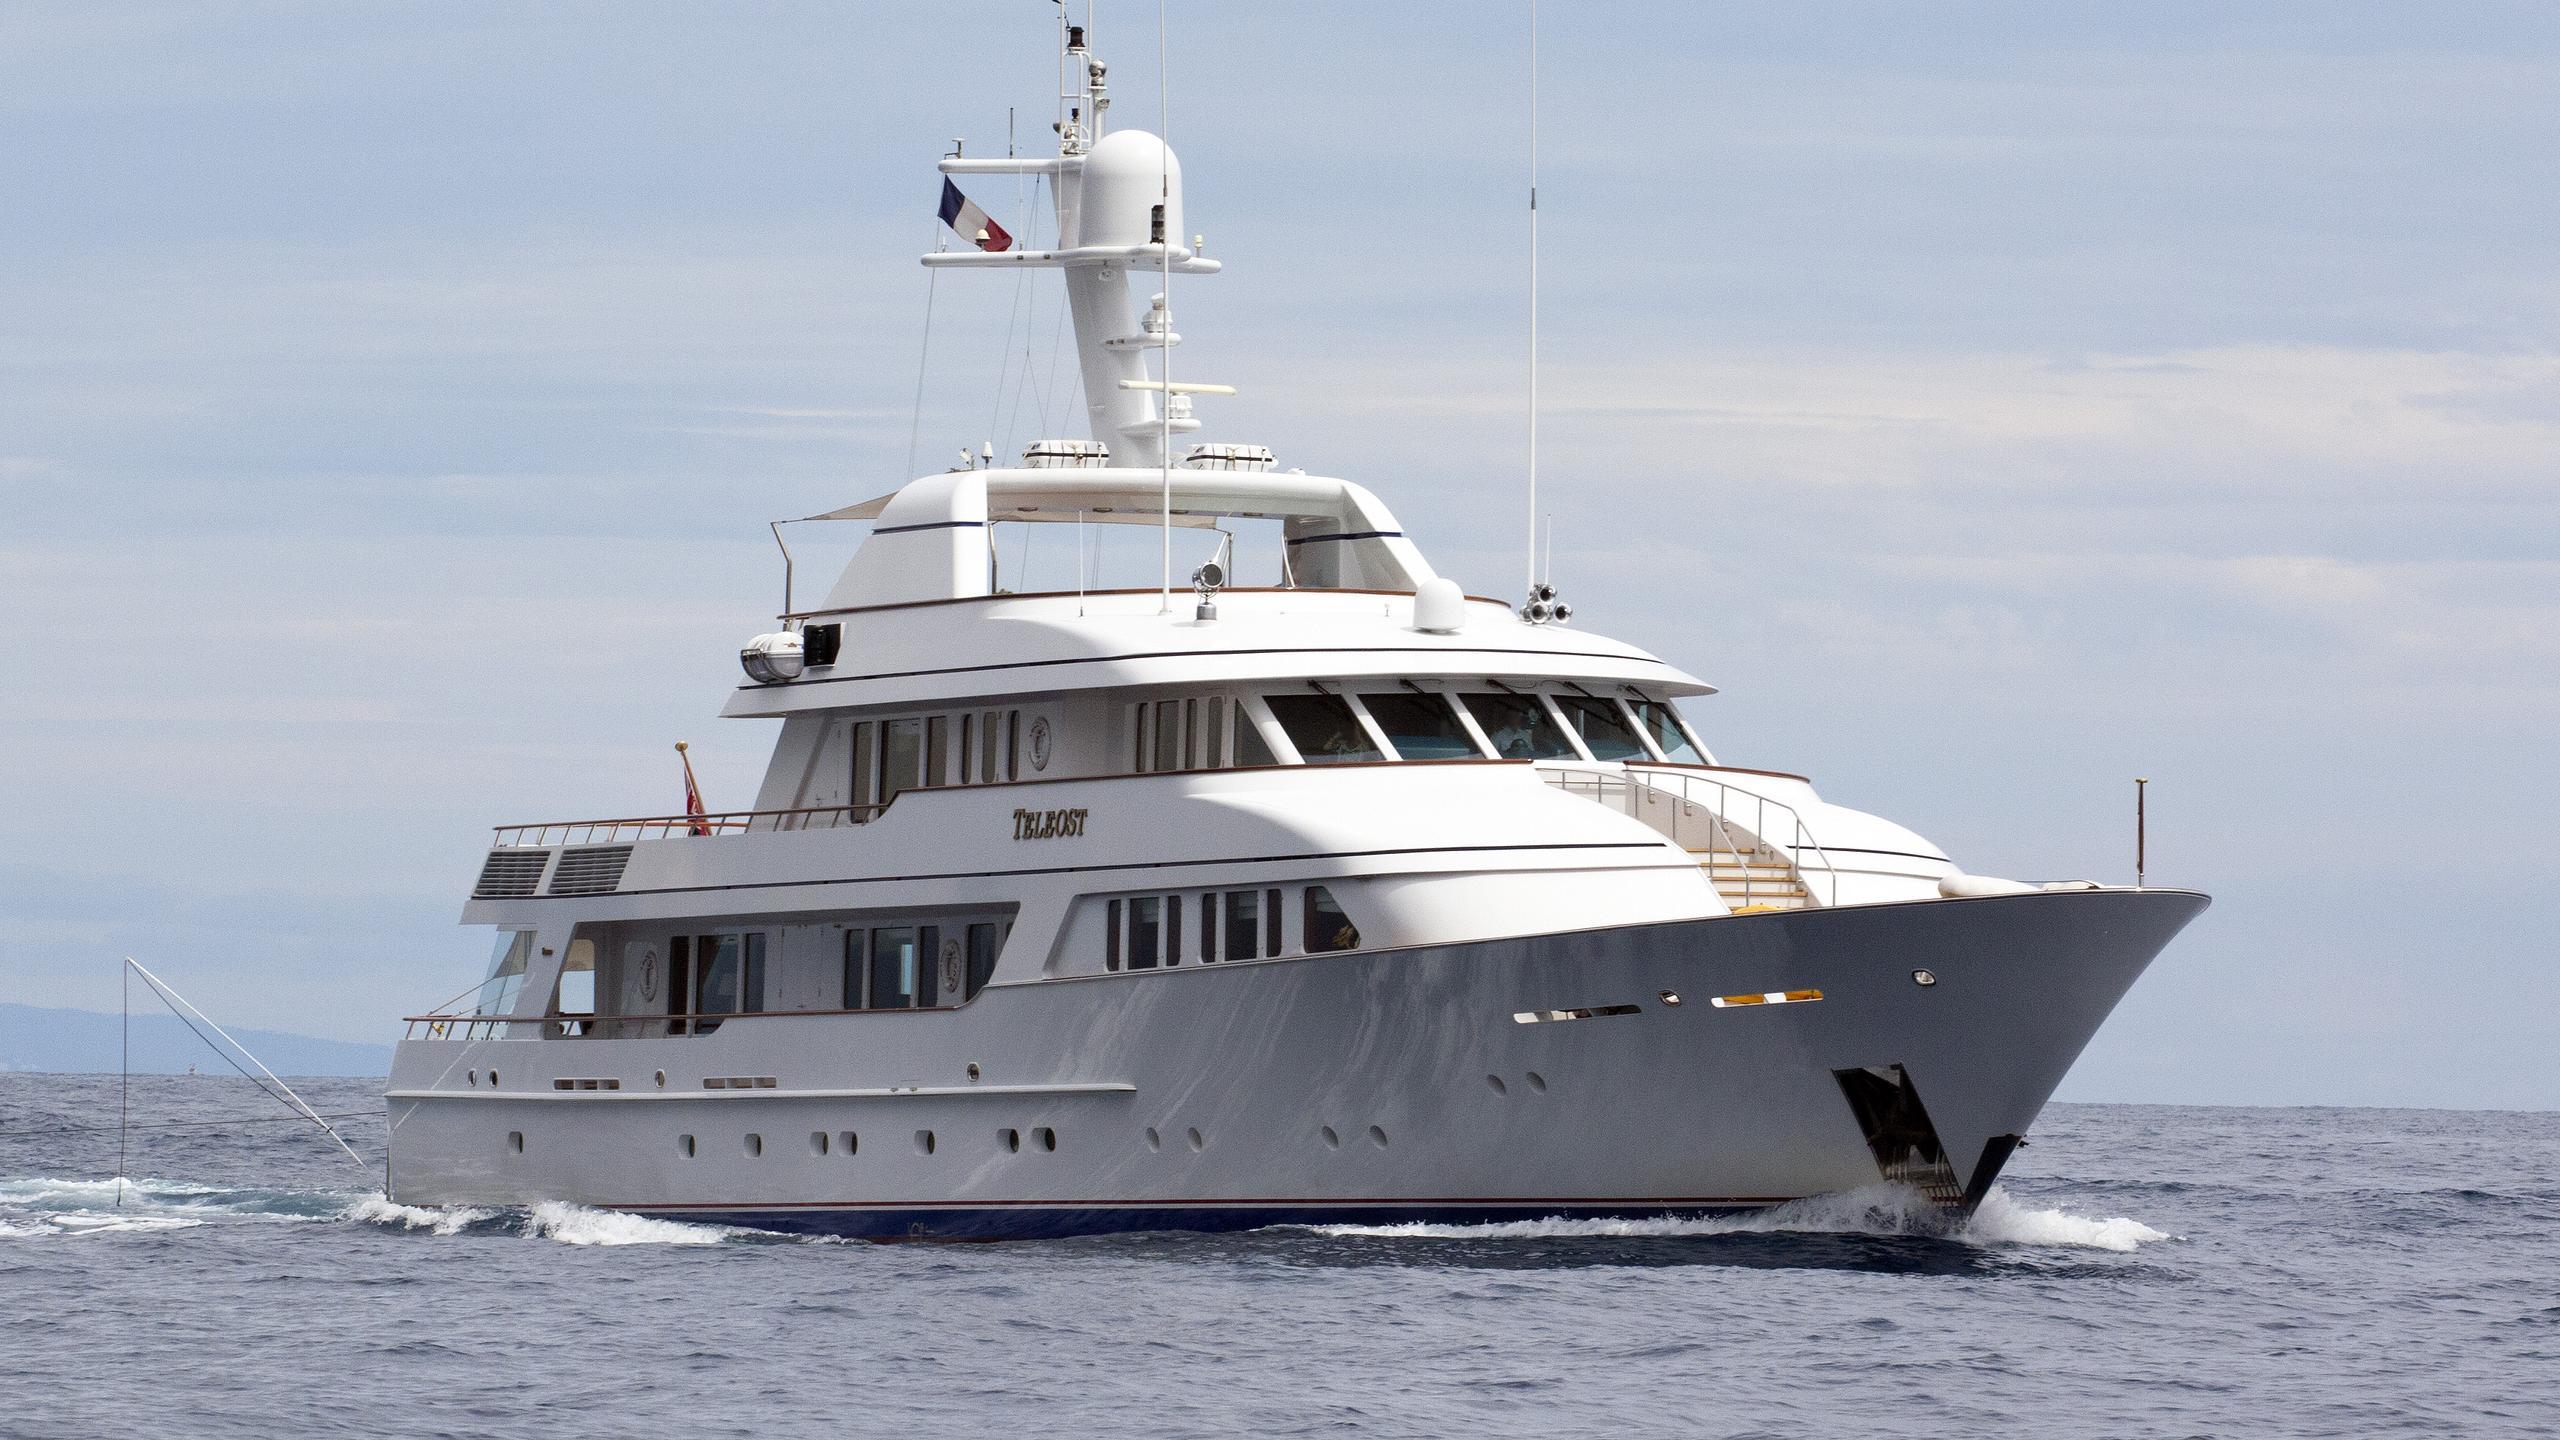 teleost-motor-yacht-feadship-1998-49m-half-profile